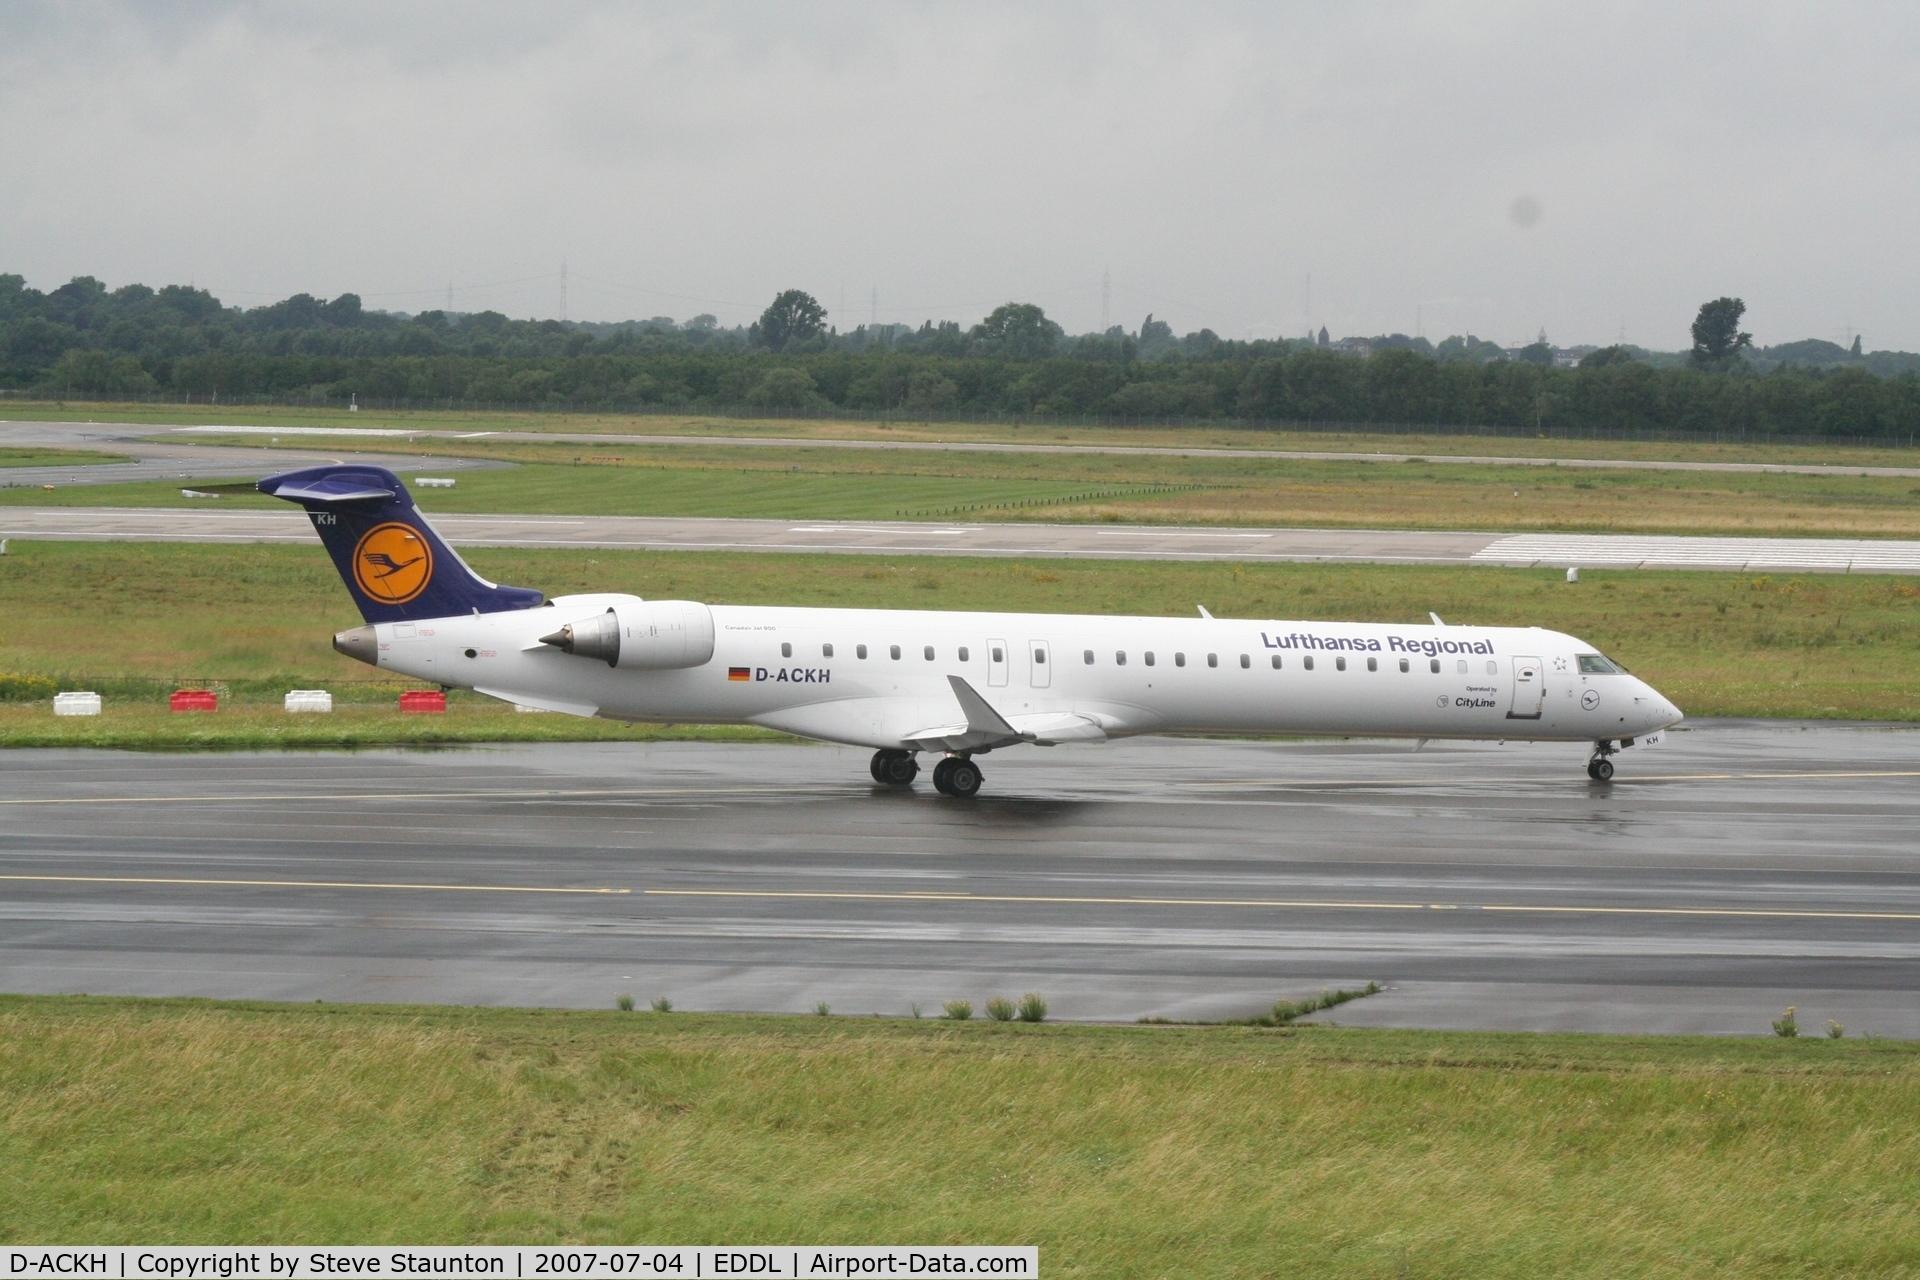 D-ACKH, 2006 Bombardier CRJ-900LR (CL-600-2D24) C/N 15085, Taken at Dusseldorf July 2007